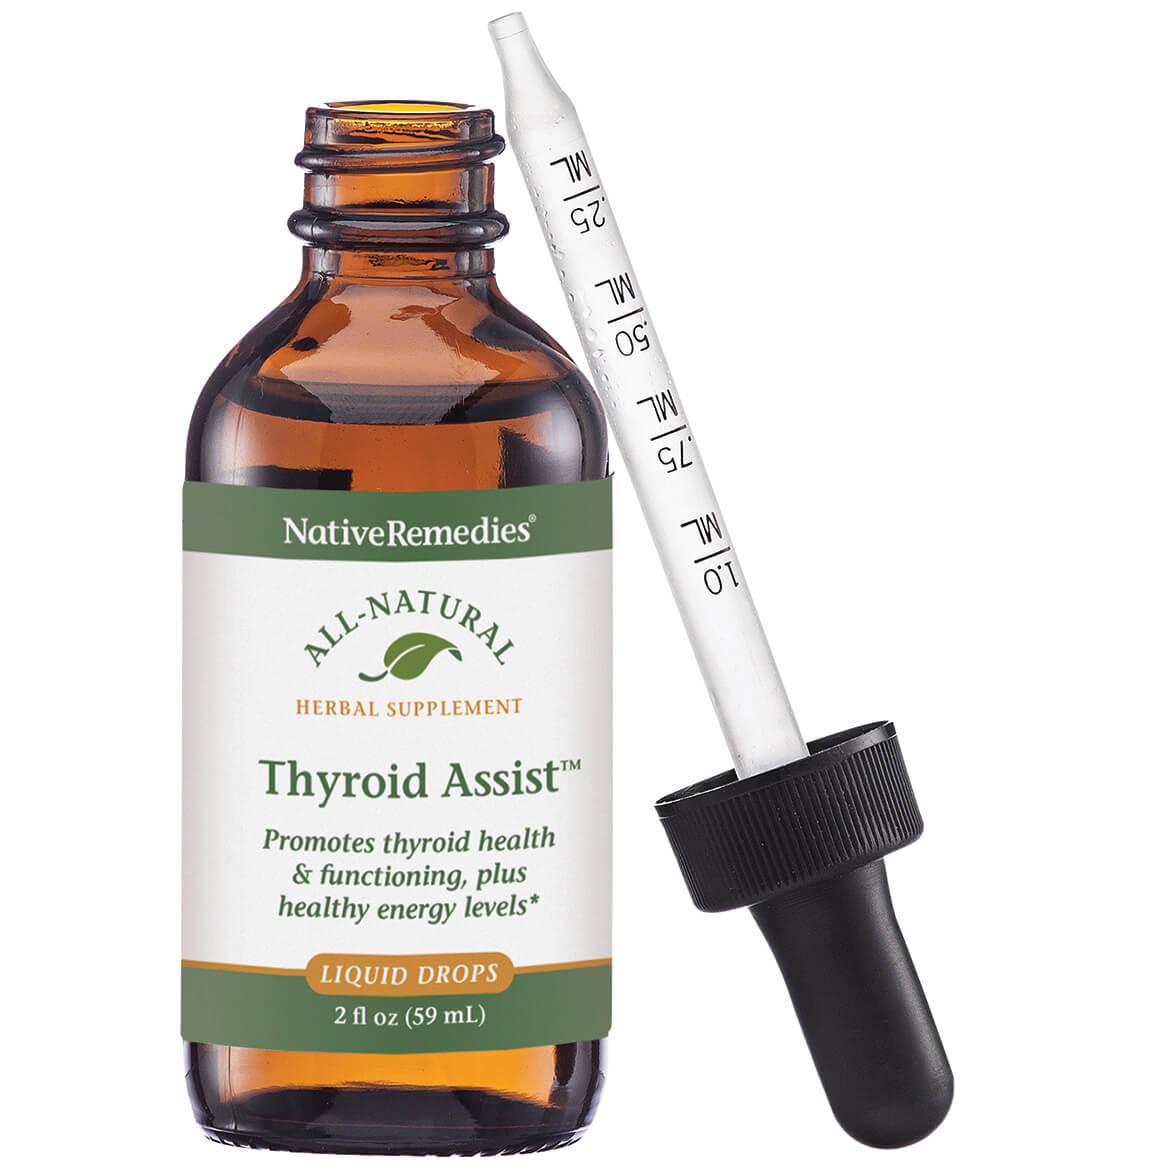 NativeRemedies® Thyroid Assist™-350104